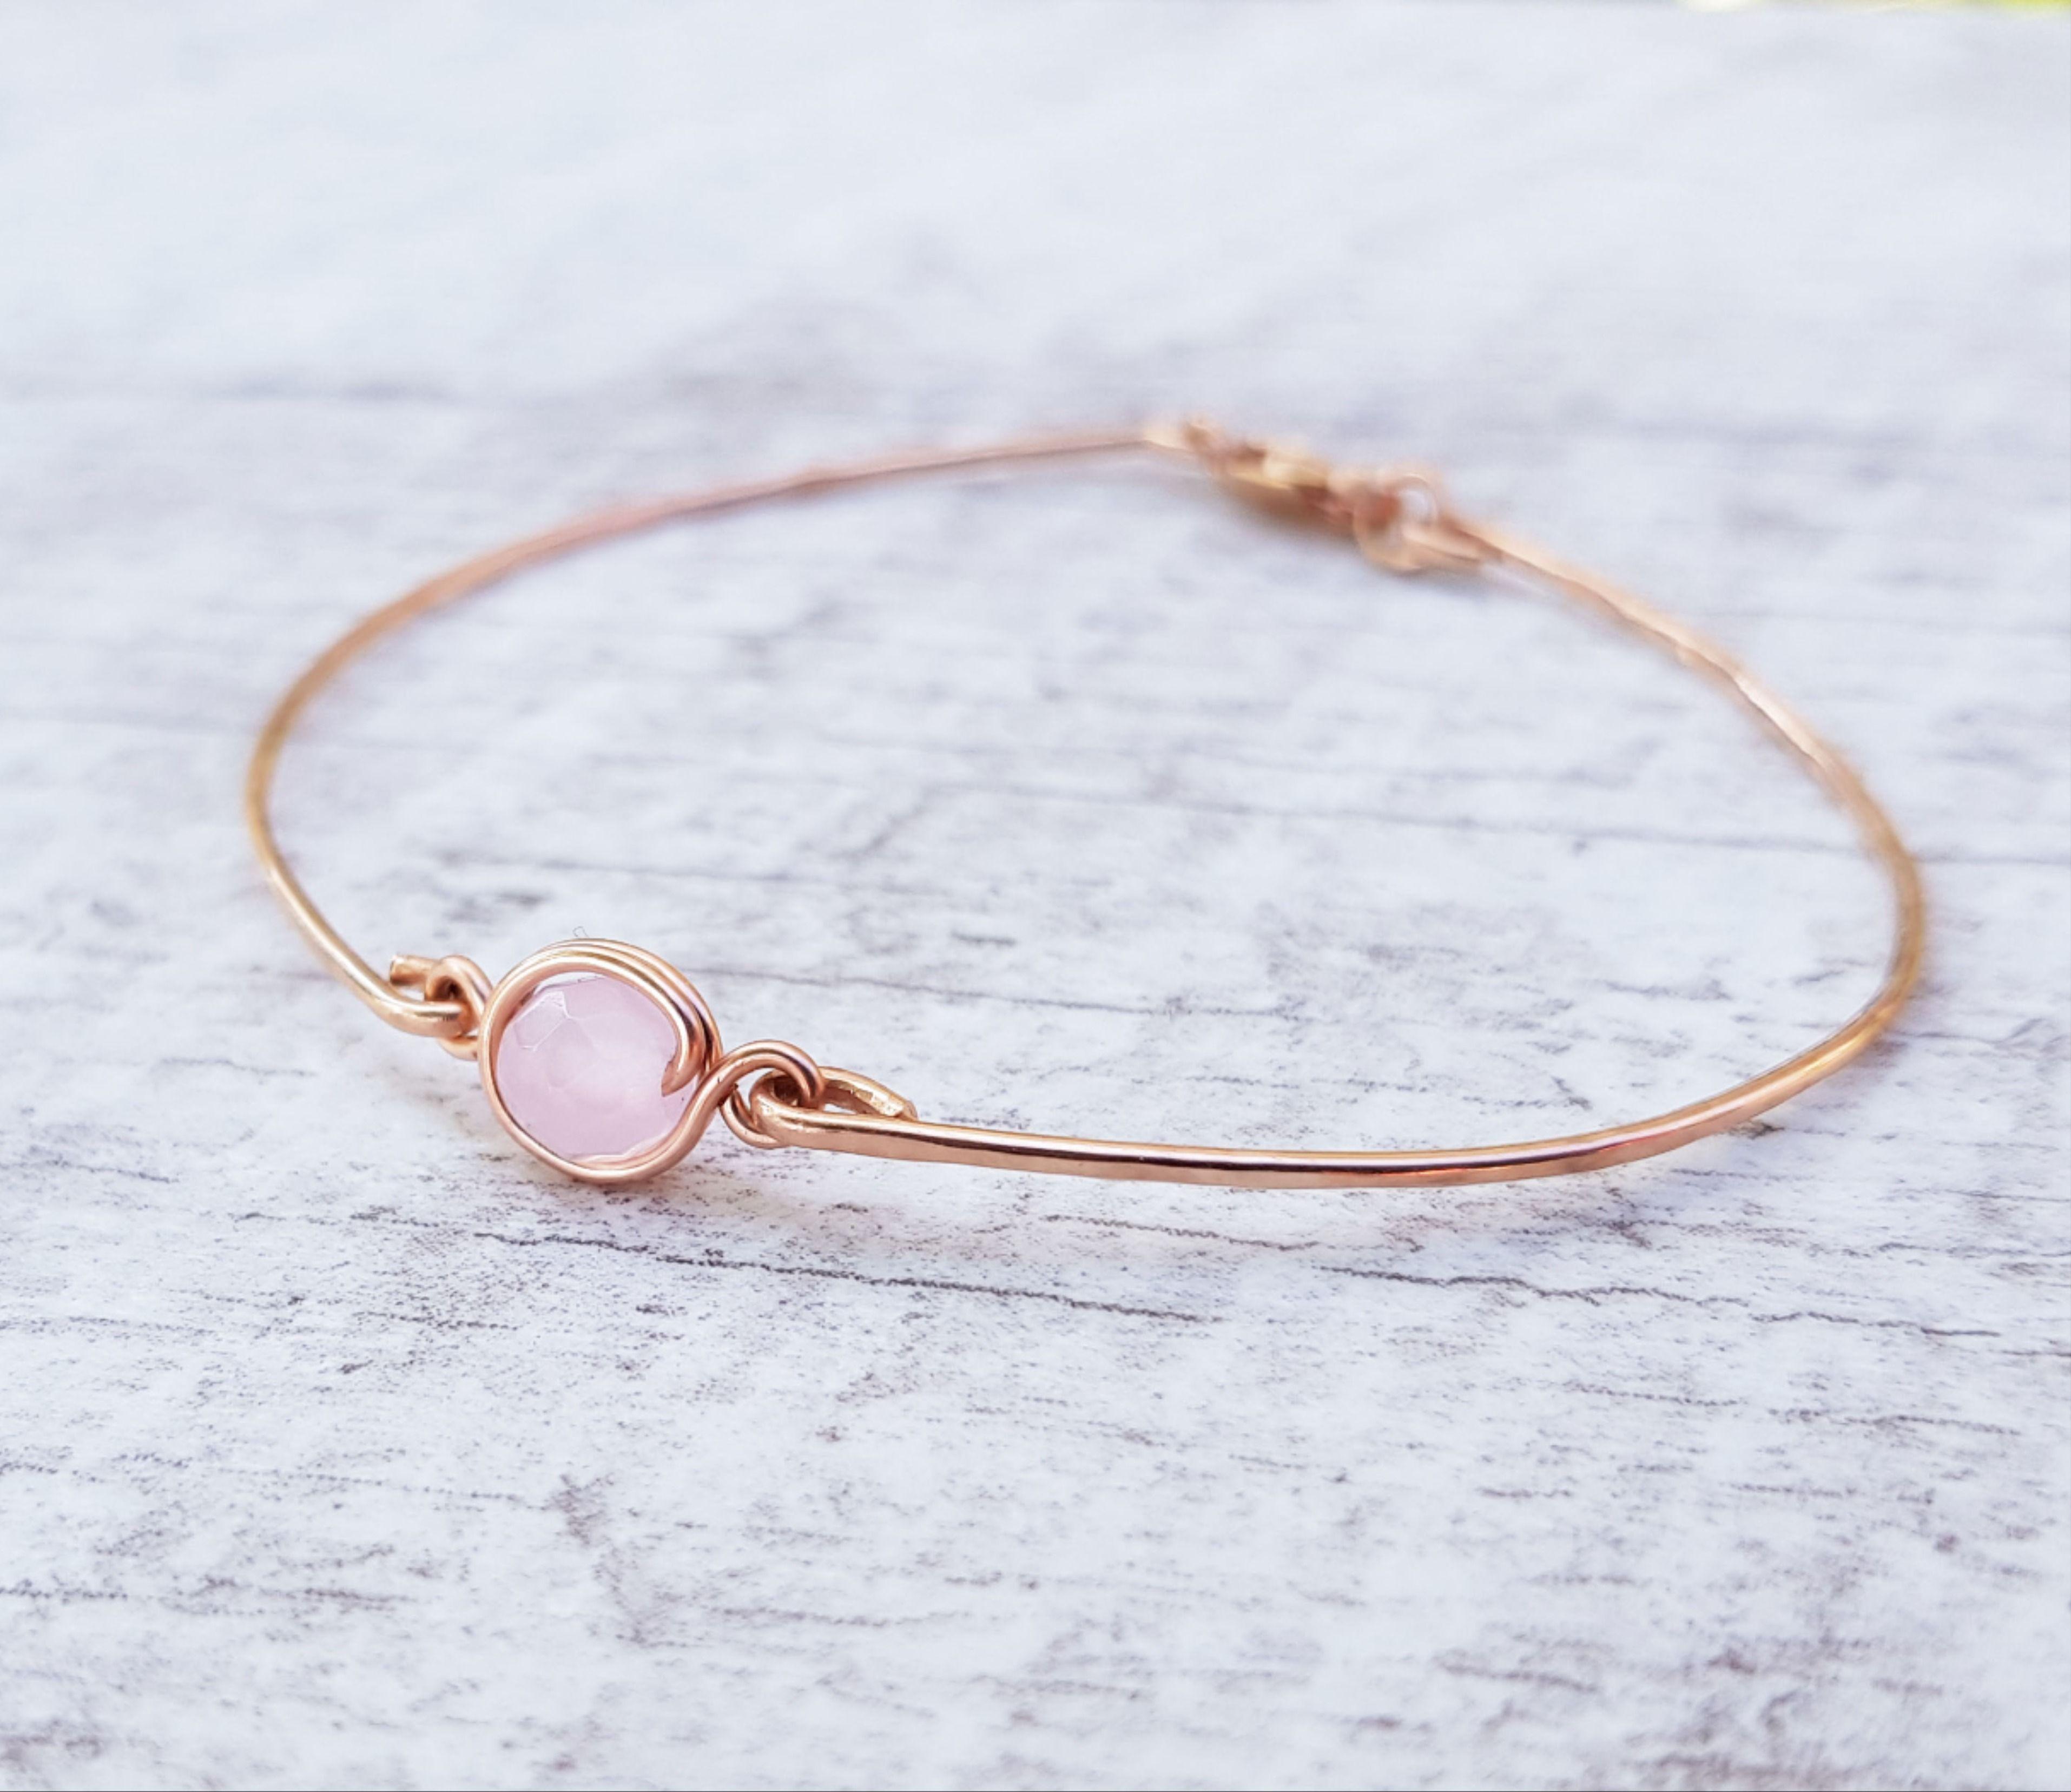 14k gold filled bracelet with bright pink rose quartz charm oval TENDER TOUCH